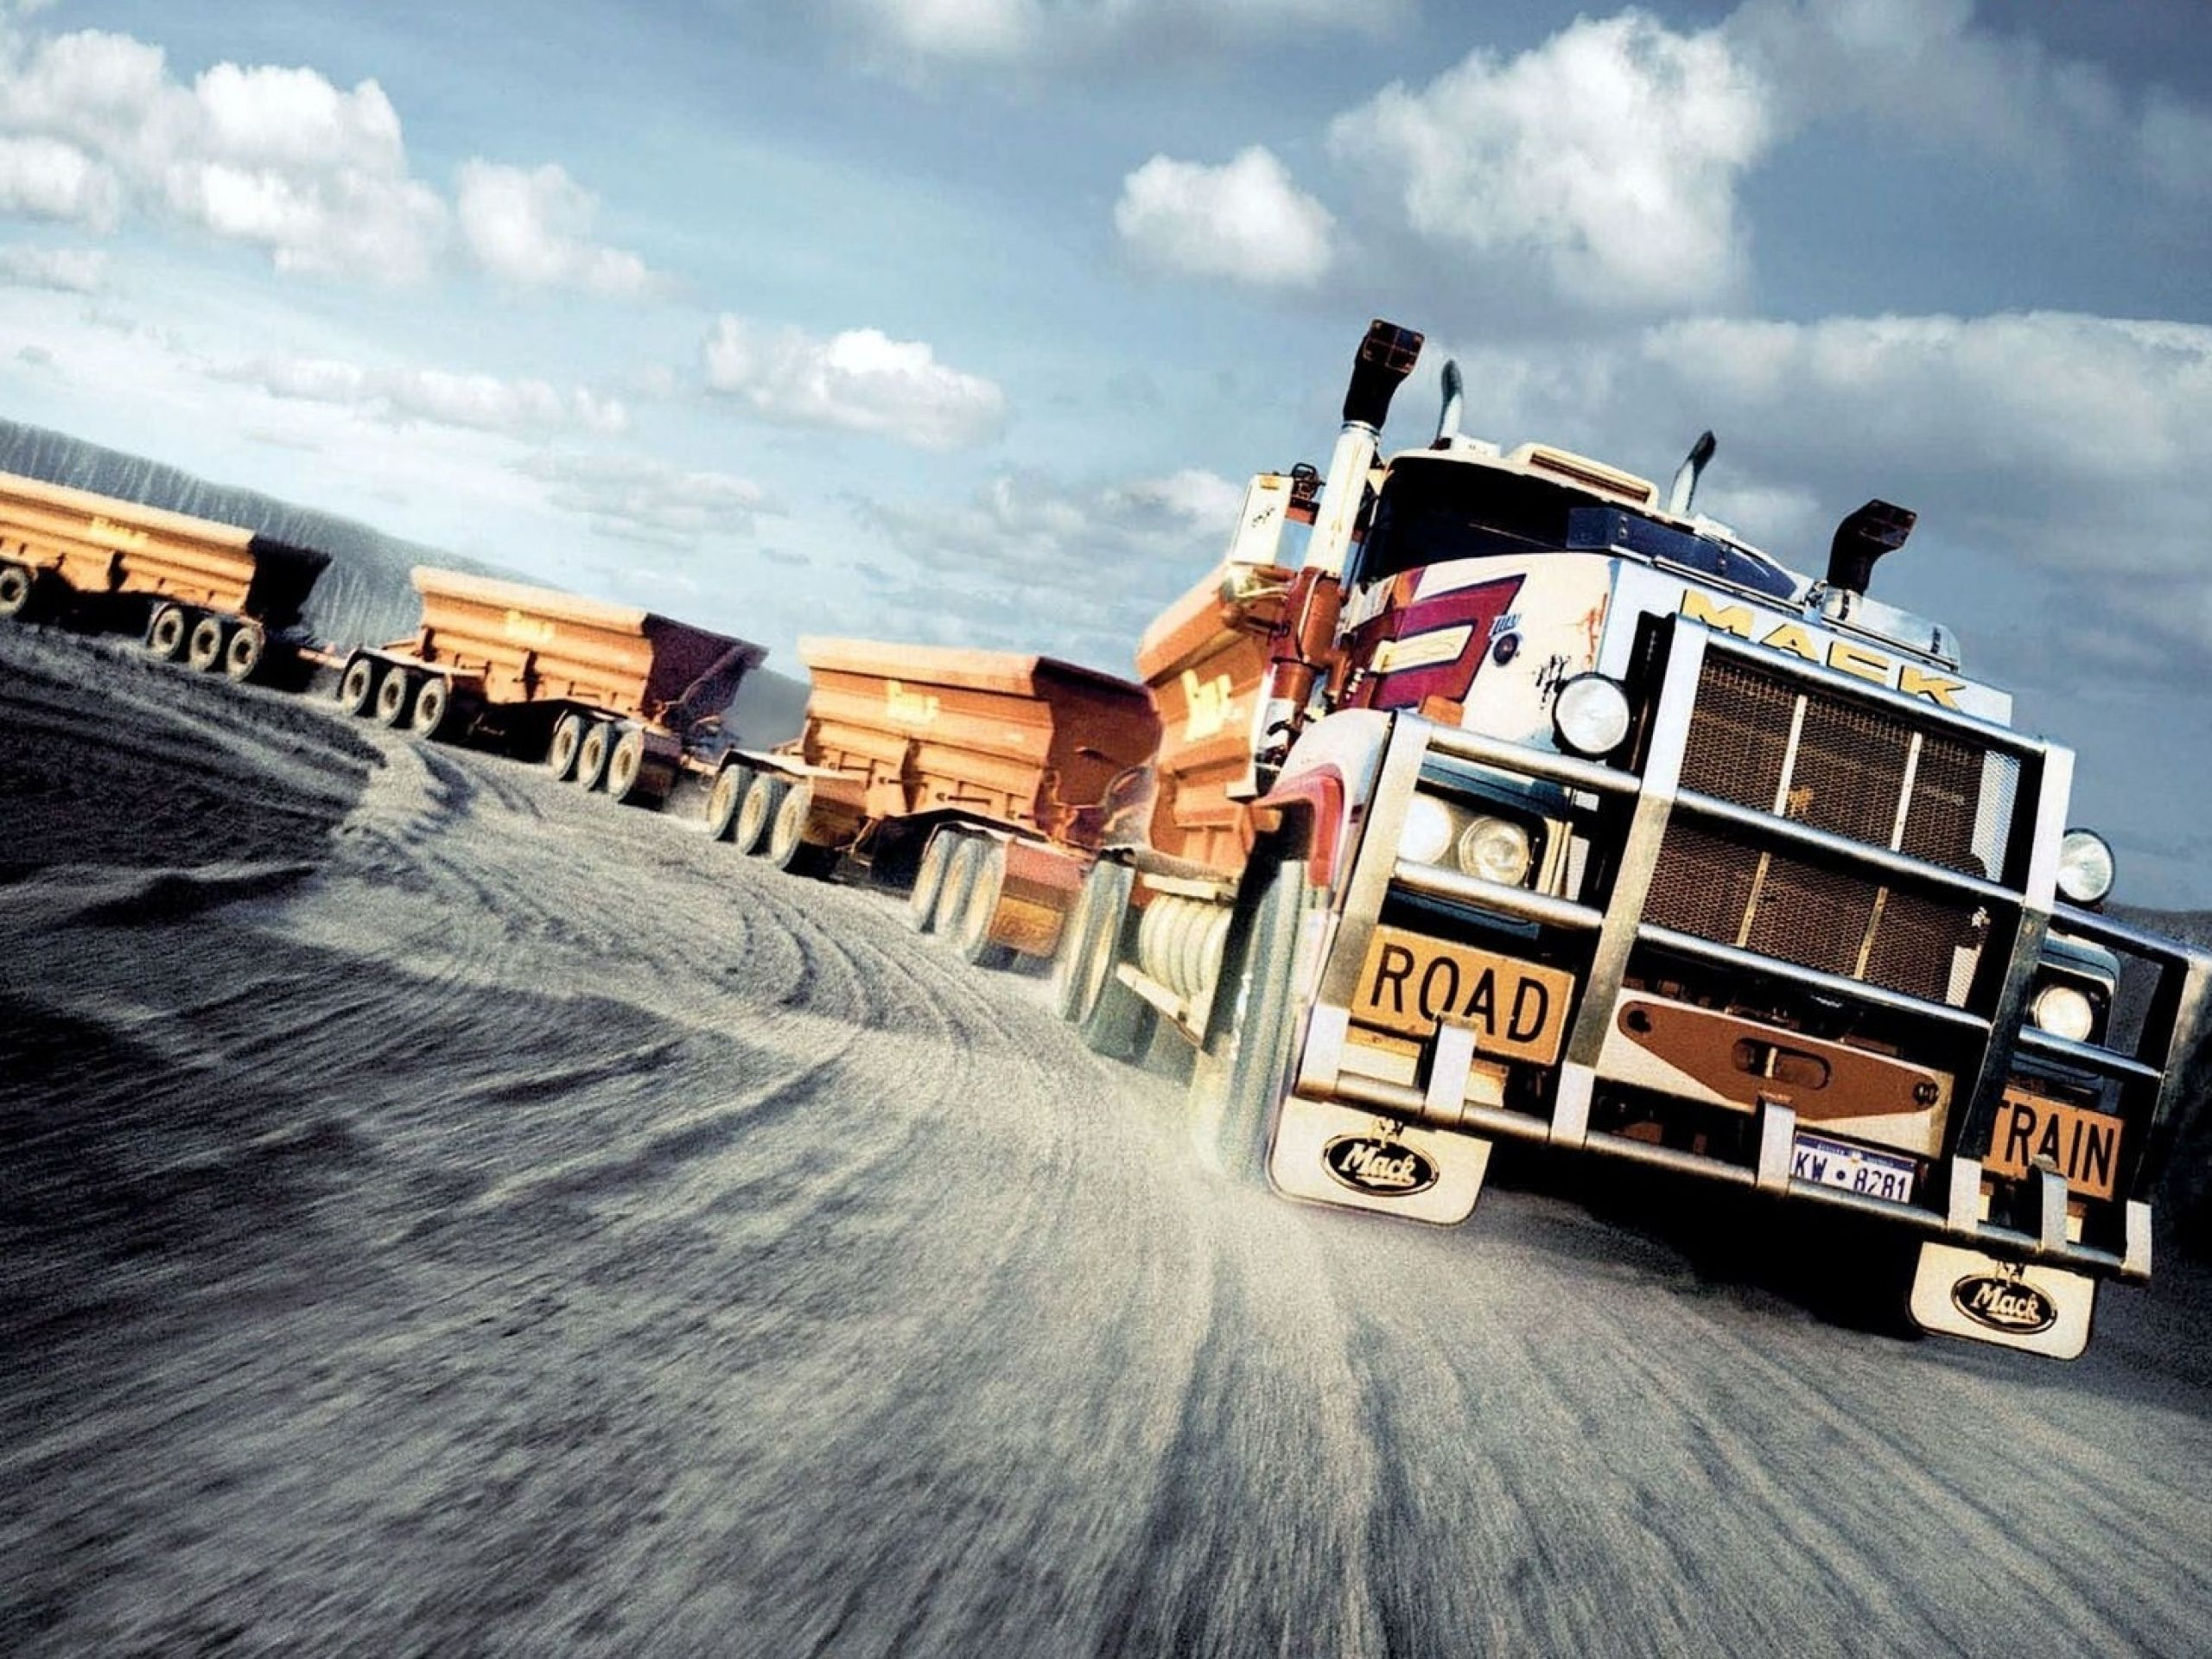 35 Mack Trucks Hd Wallpapers Backgrounds Wallpaper Abyss